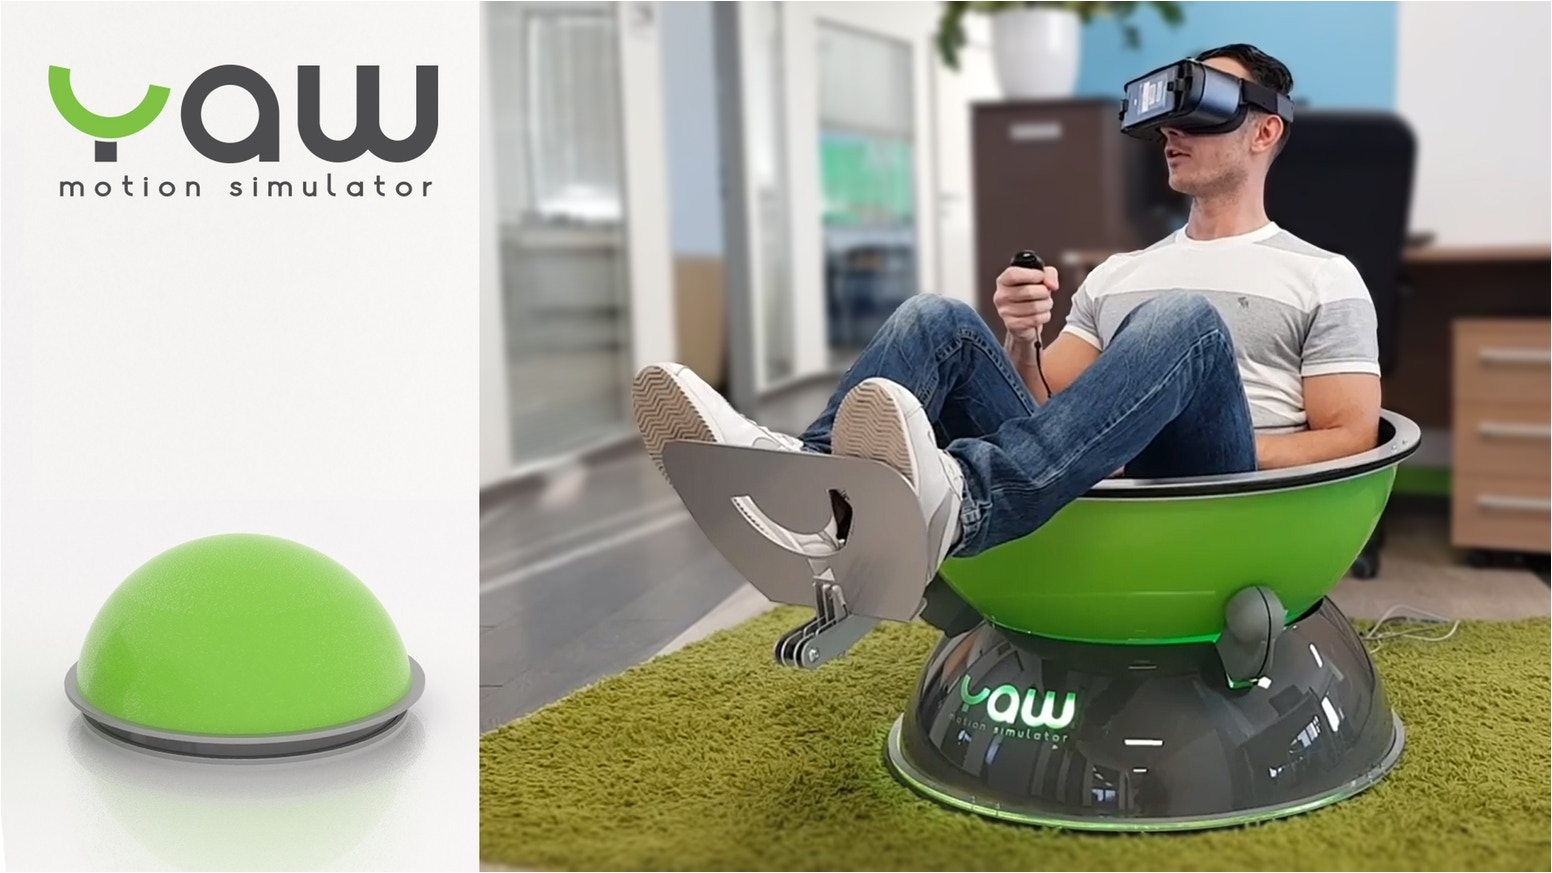 Fidget Chair Kickstarter Yaw Vr Compact Portable Motion Simulator by Industrial Cybernetics